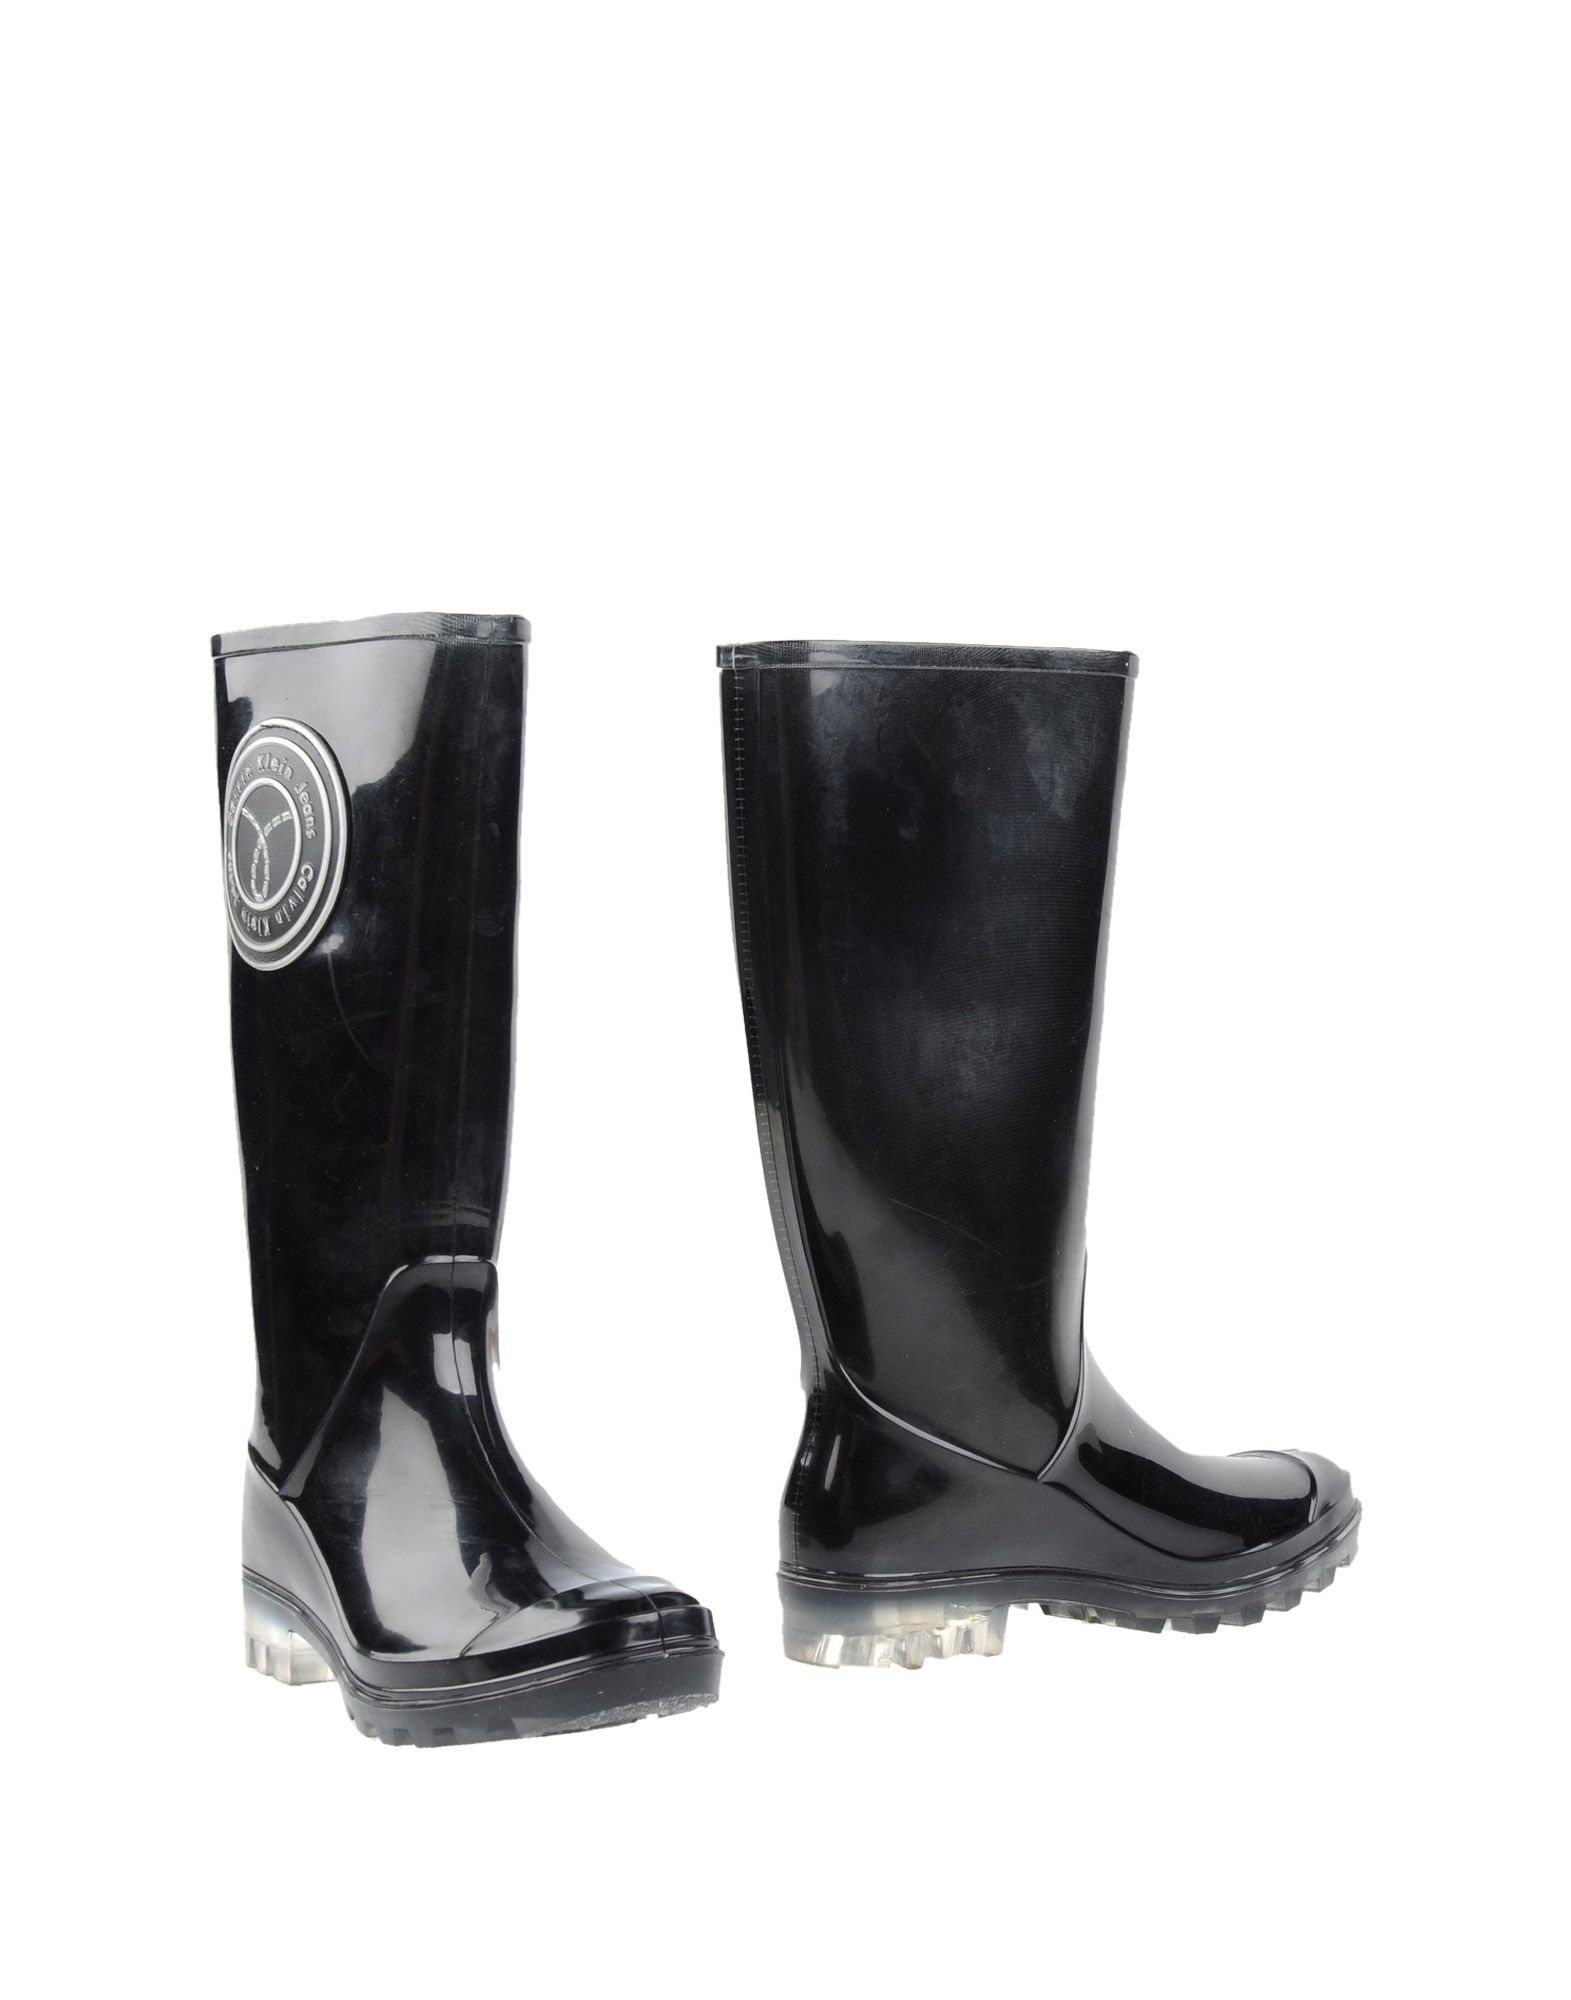 Lyst - Calvin klein jeans Boots in Black